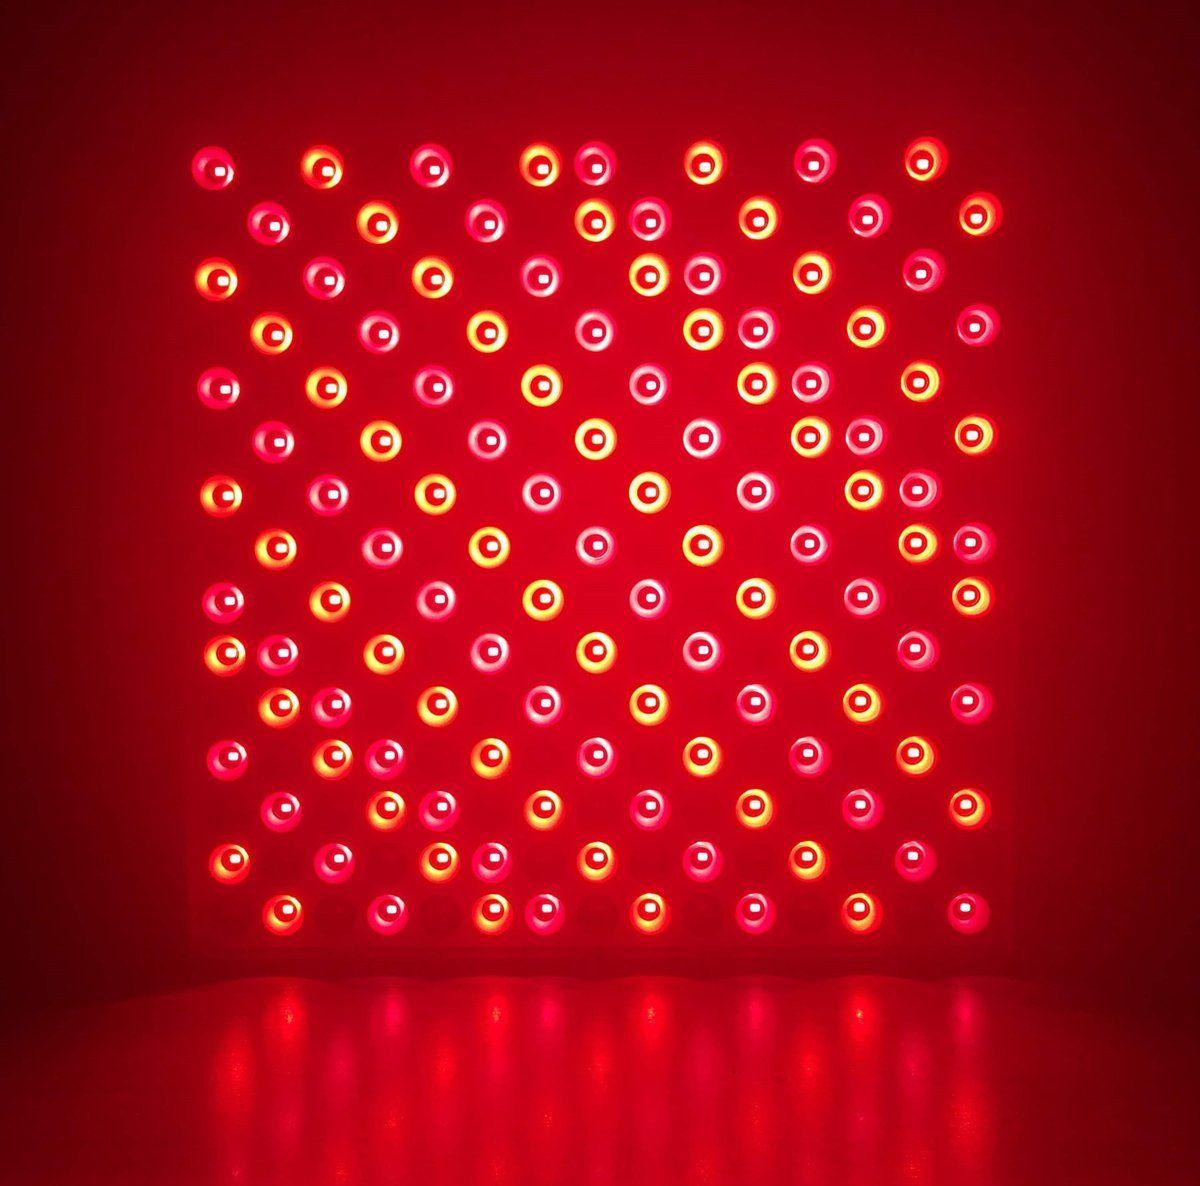 Gembared Rex Nir Red Led Light Panel Red Led Light Therapy Red Led Lights Led Panel Light